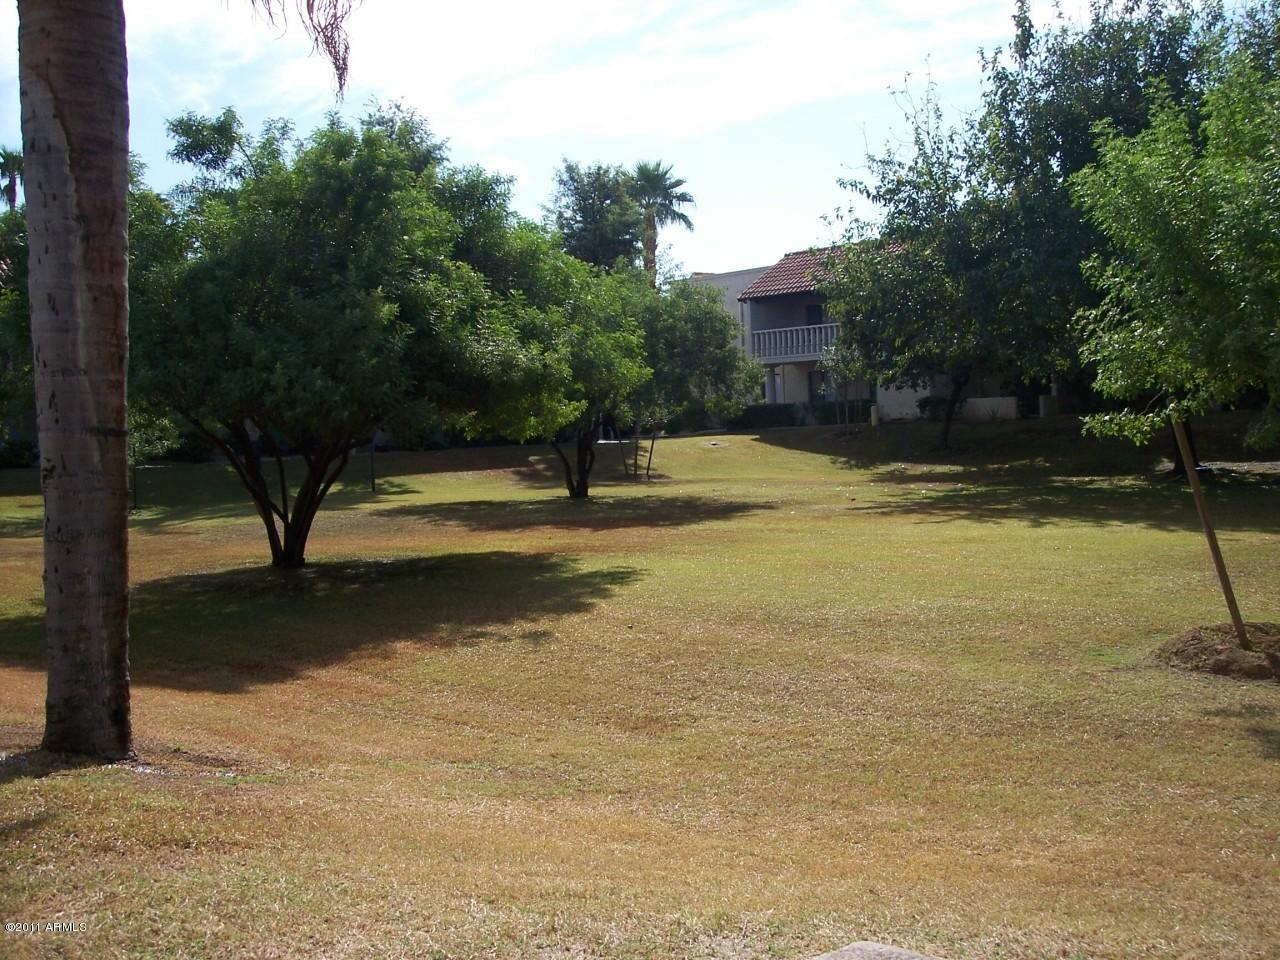 8649 E Royal Palm Road, Unit 104, Scottsdale AZ 85258 - Photo 1